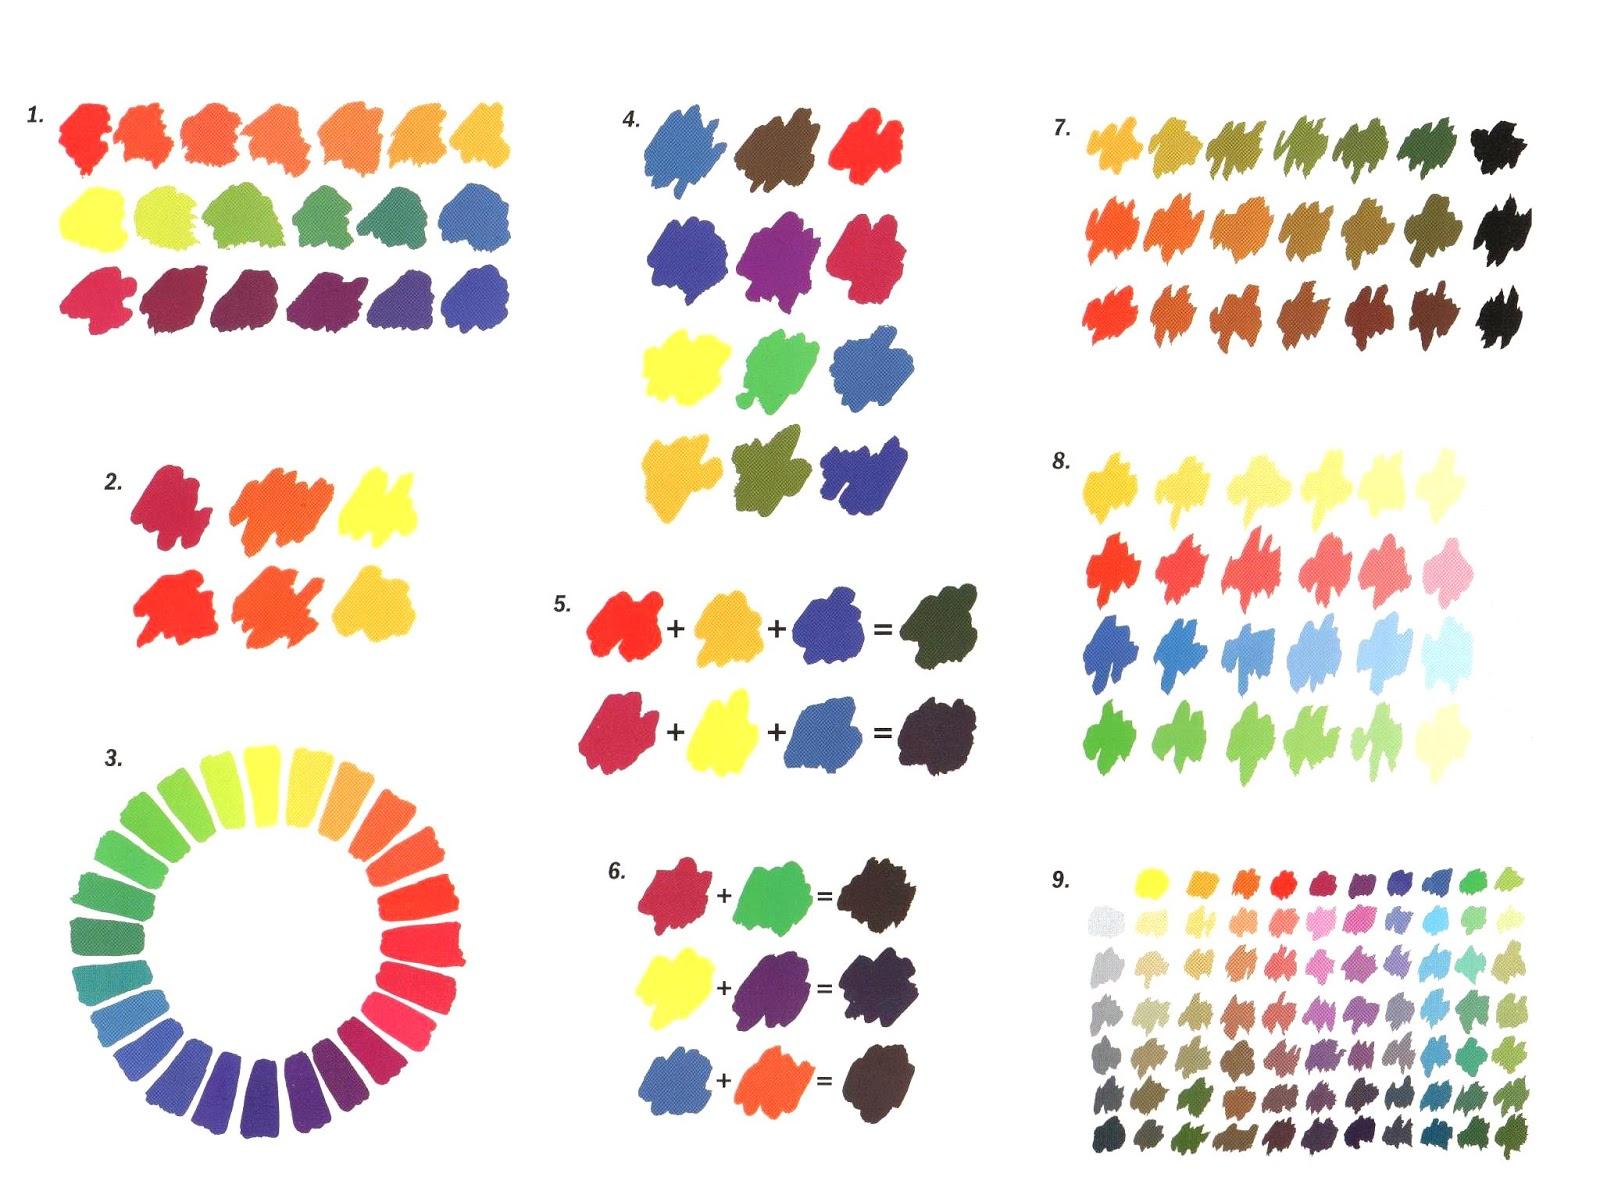 Cartas de colores pinturas para el arte mezcla de for Mezclar colores de pintura